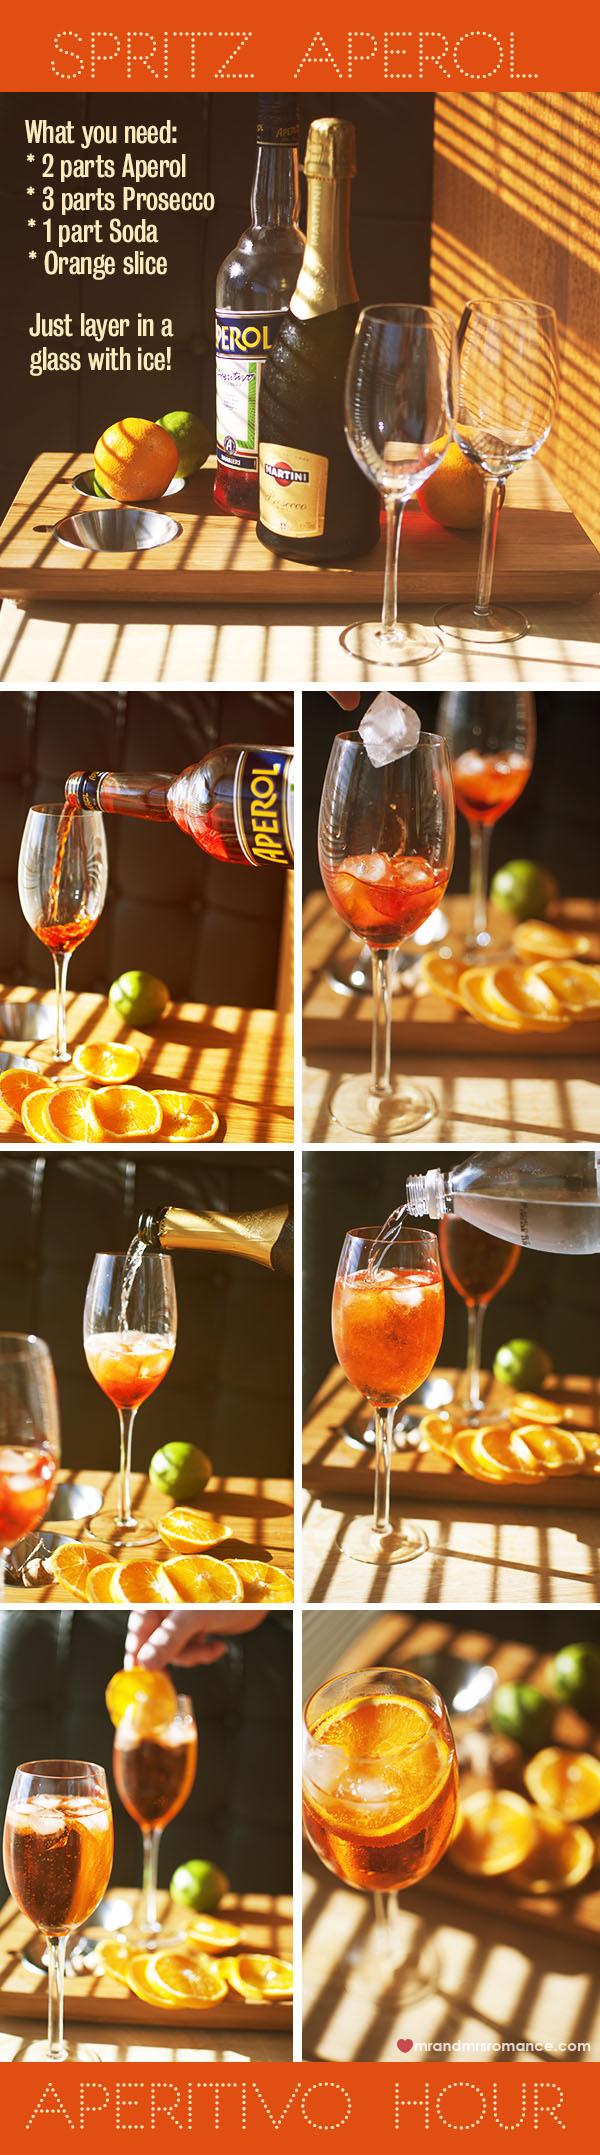 Mr and Mrs Romance - Aperitivo Hour - Spritz Aperol Recipe guide